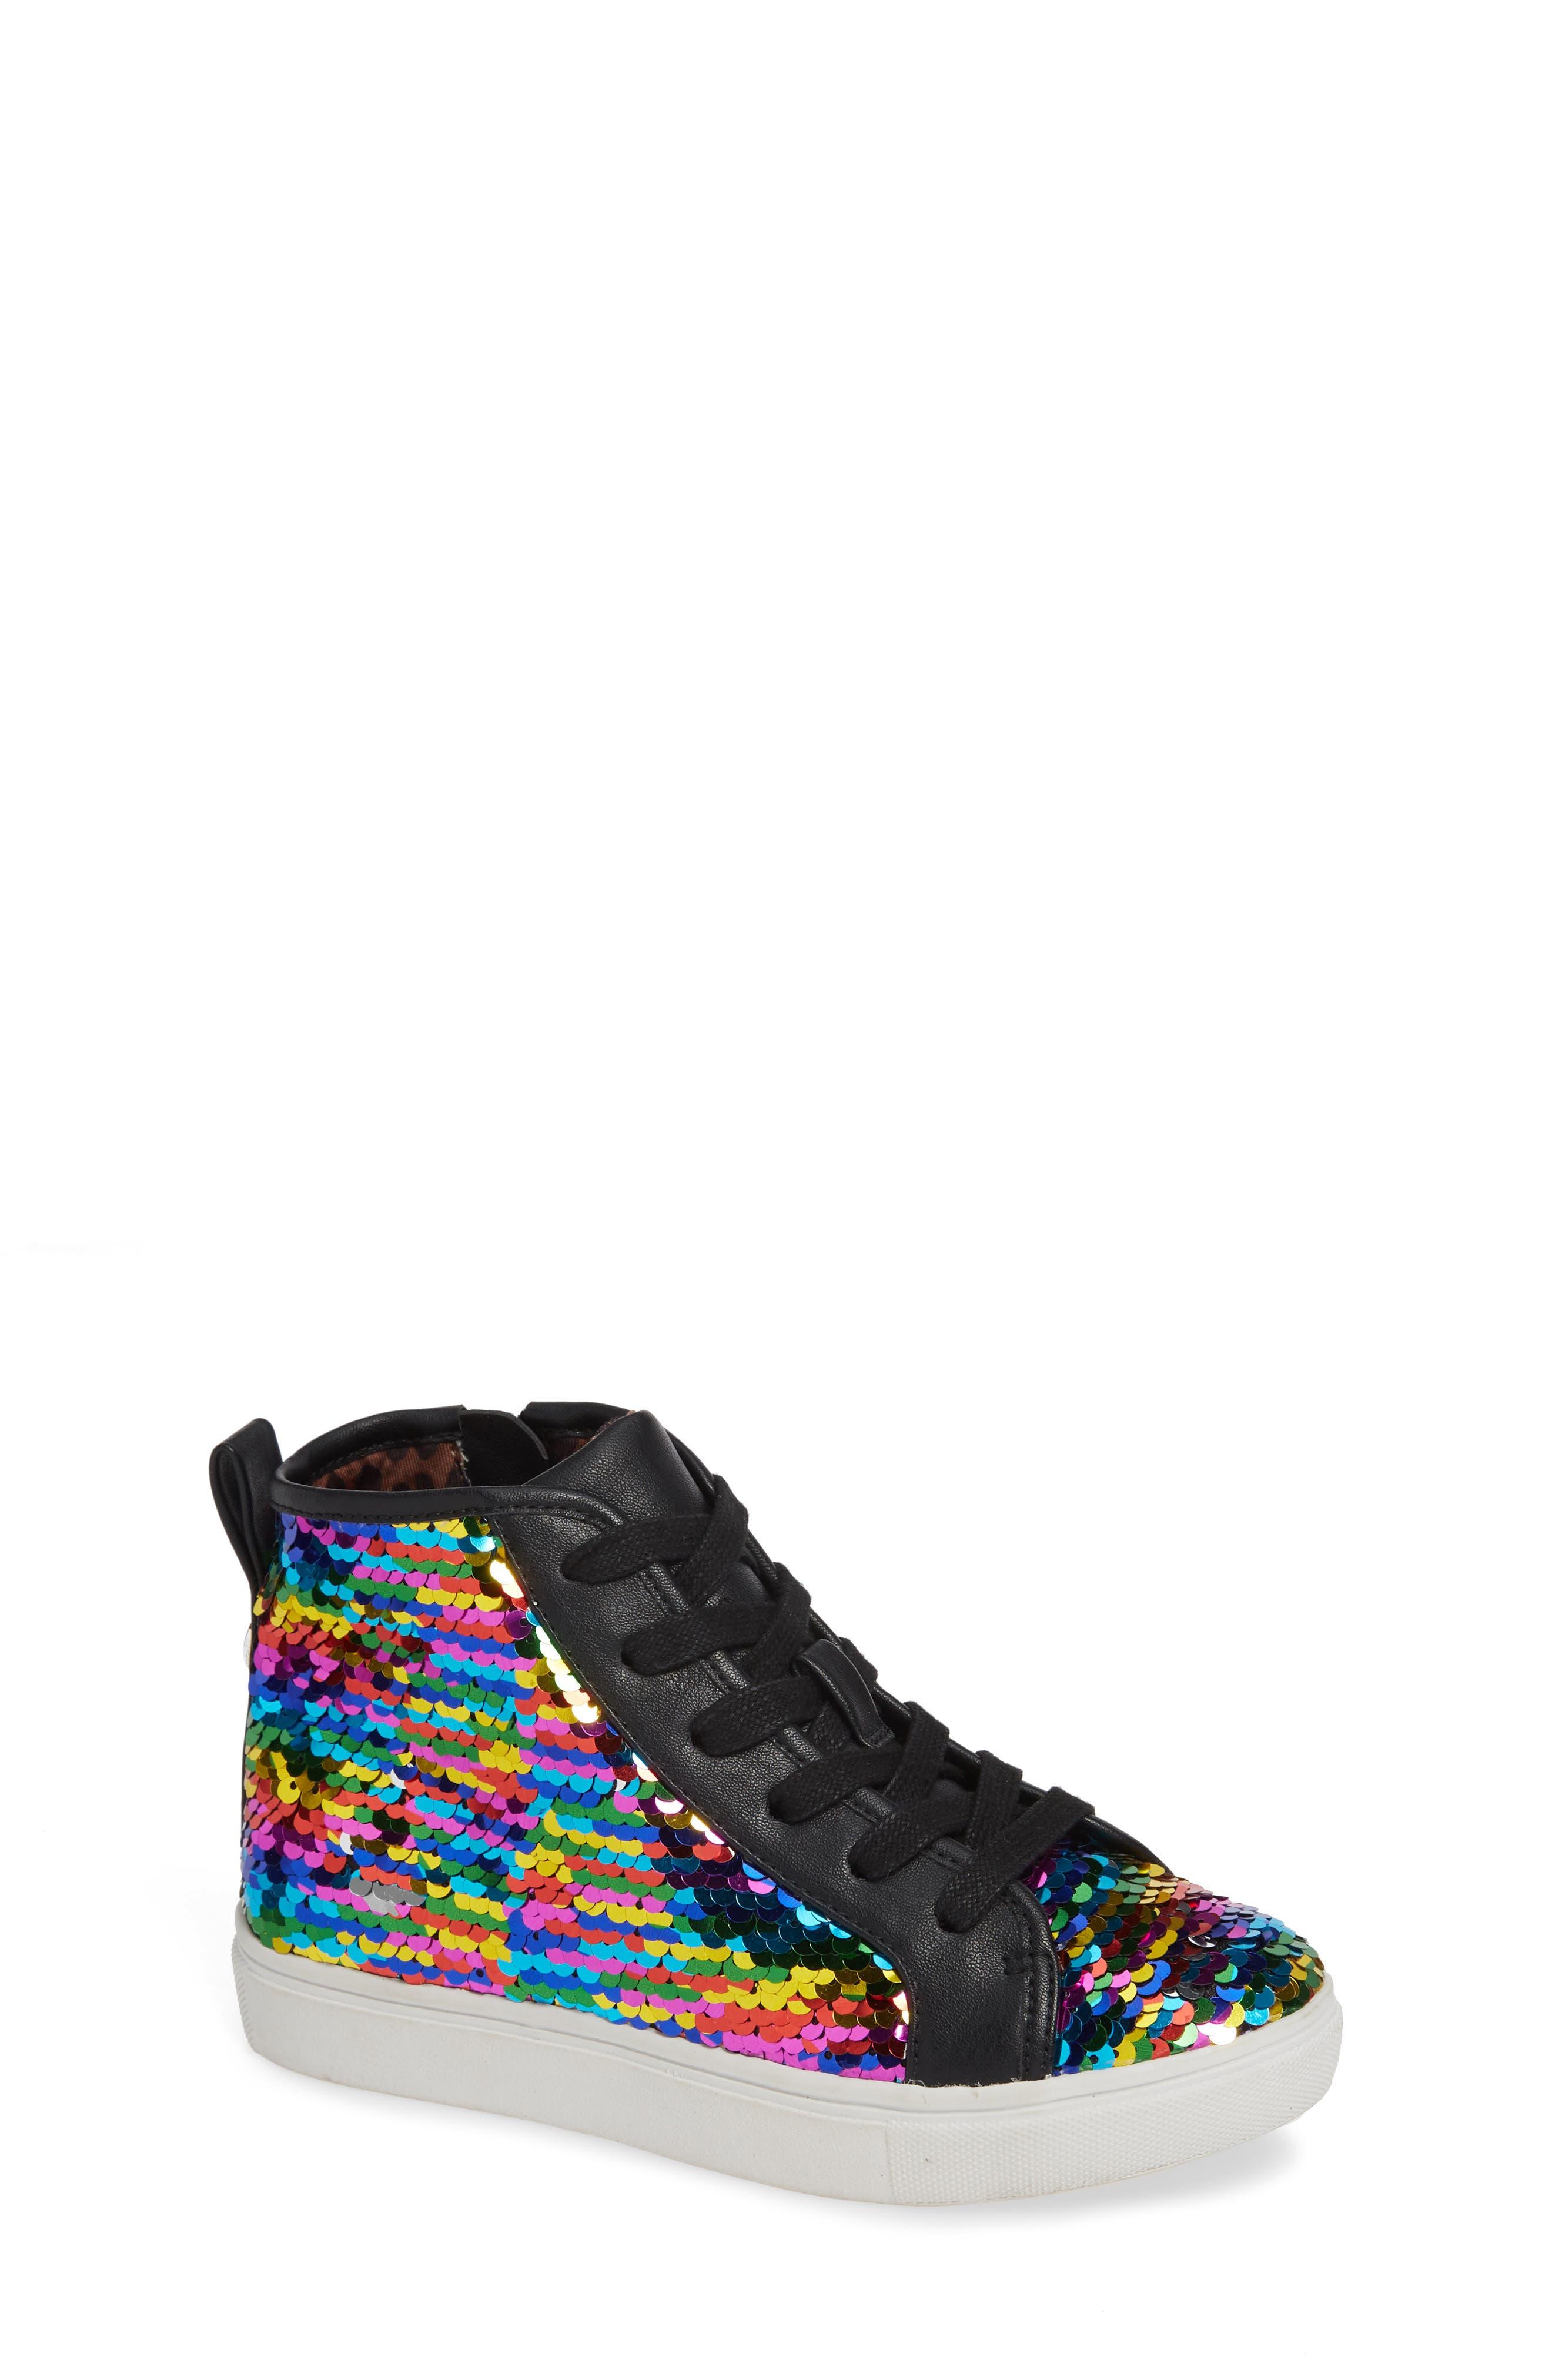 STEVE MADDEN JSEEKER Sneaker, Main, color, MULTI